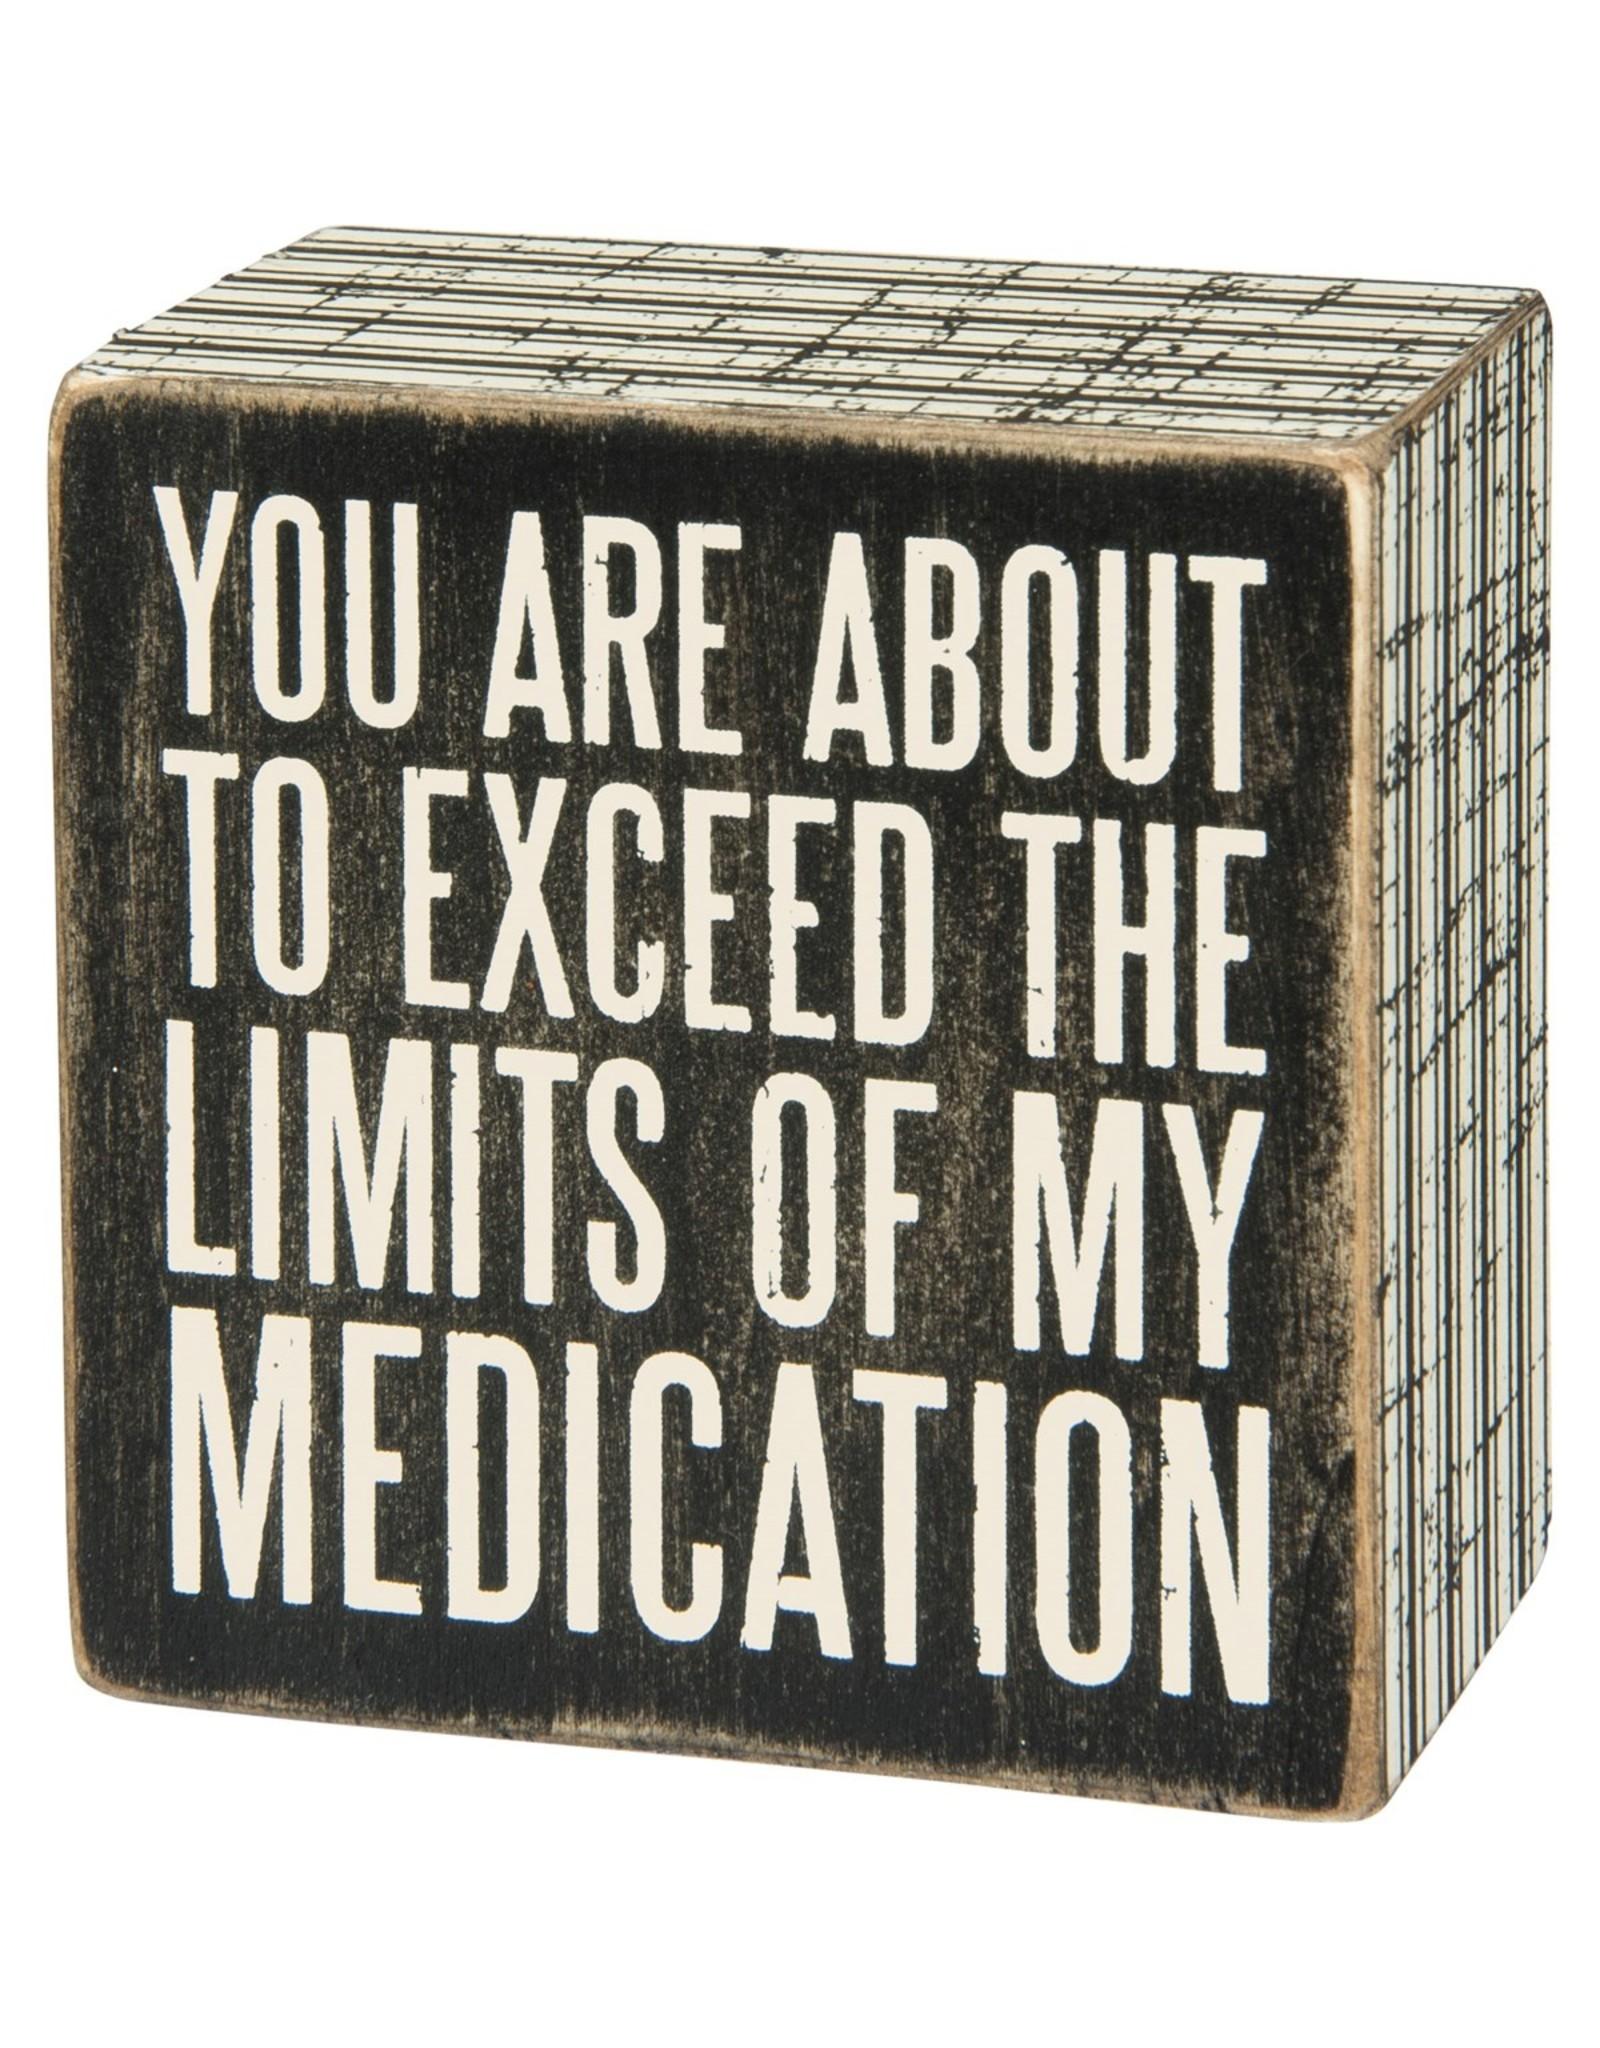 PRIMITIVES BY KATHY ATTITUDE BLOCK SIGNS MEDICATION